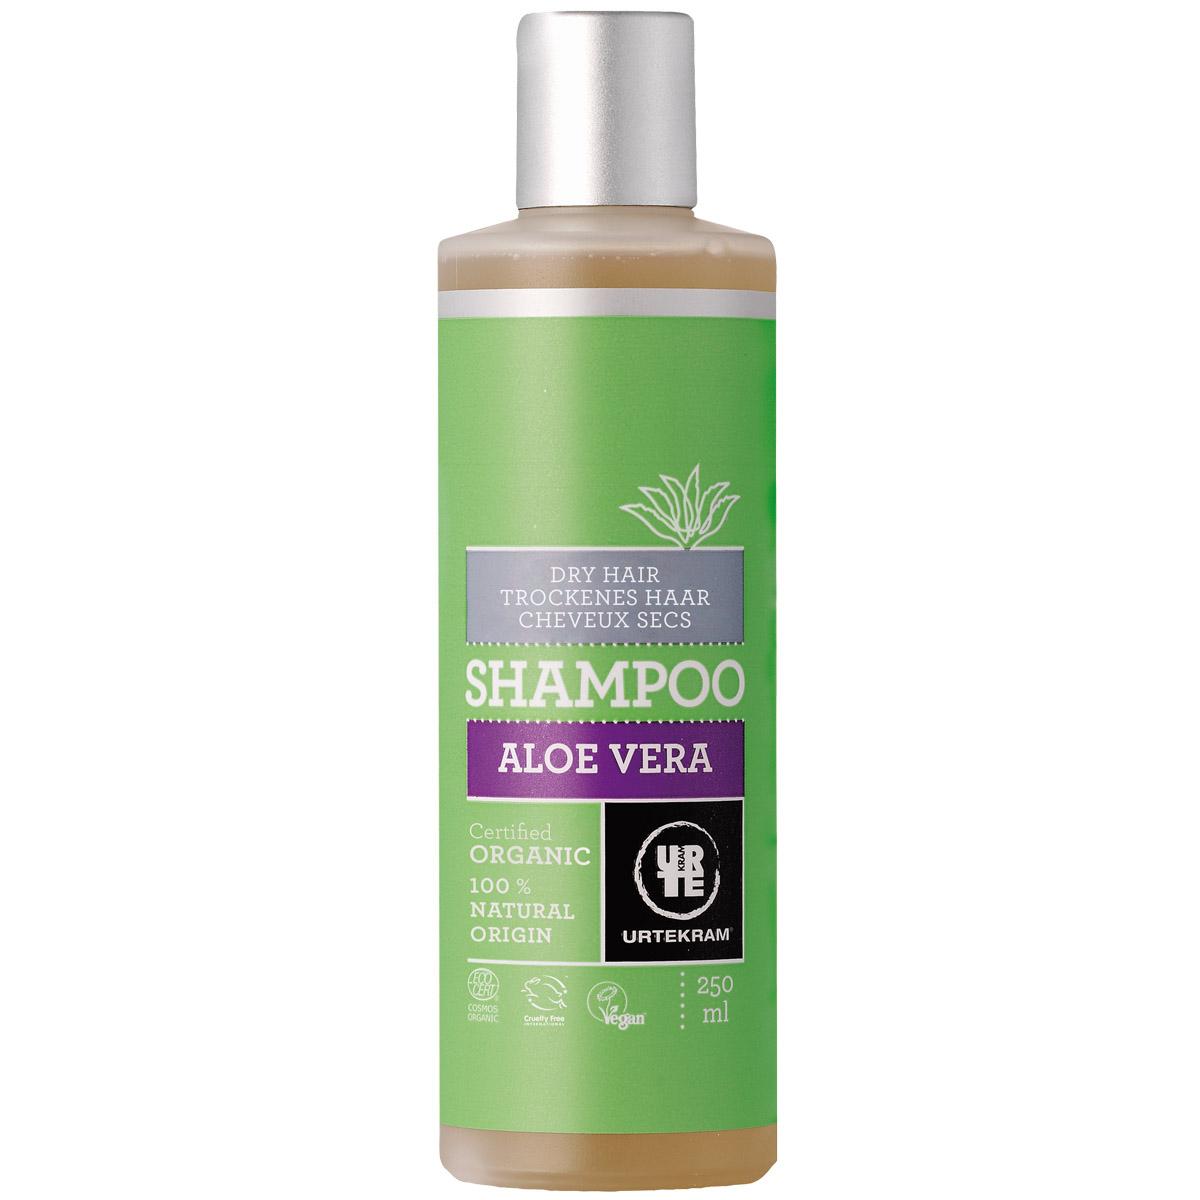 Шампунь для сухих волос Urtekram алоэ вера 250 мл<br>